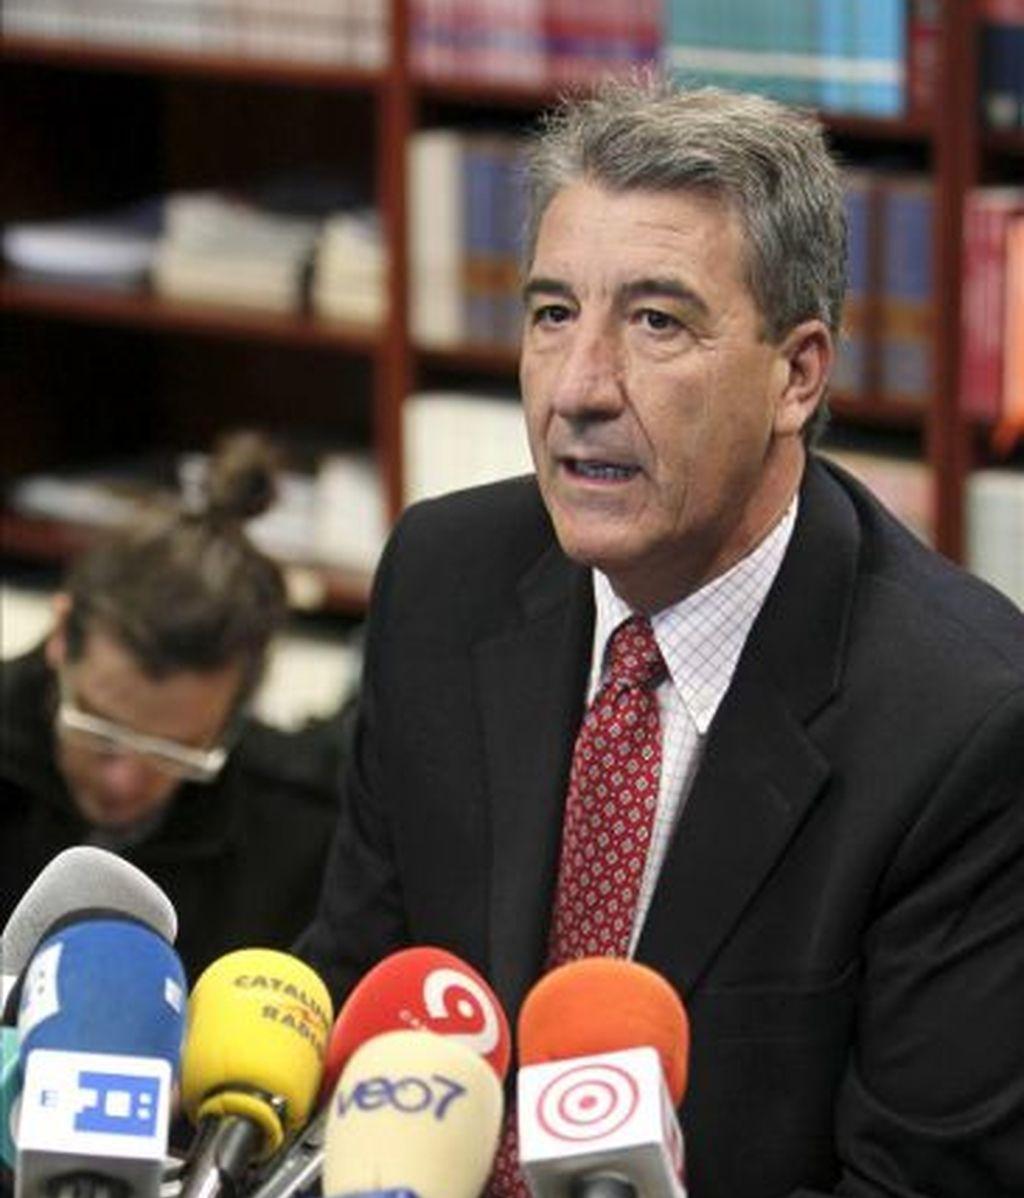 El fiscal jefe de la Audiencia madrileña, Eduardo Esteban.